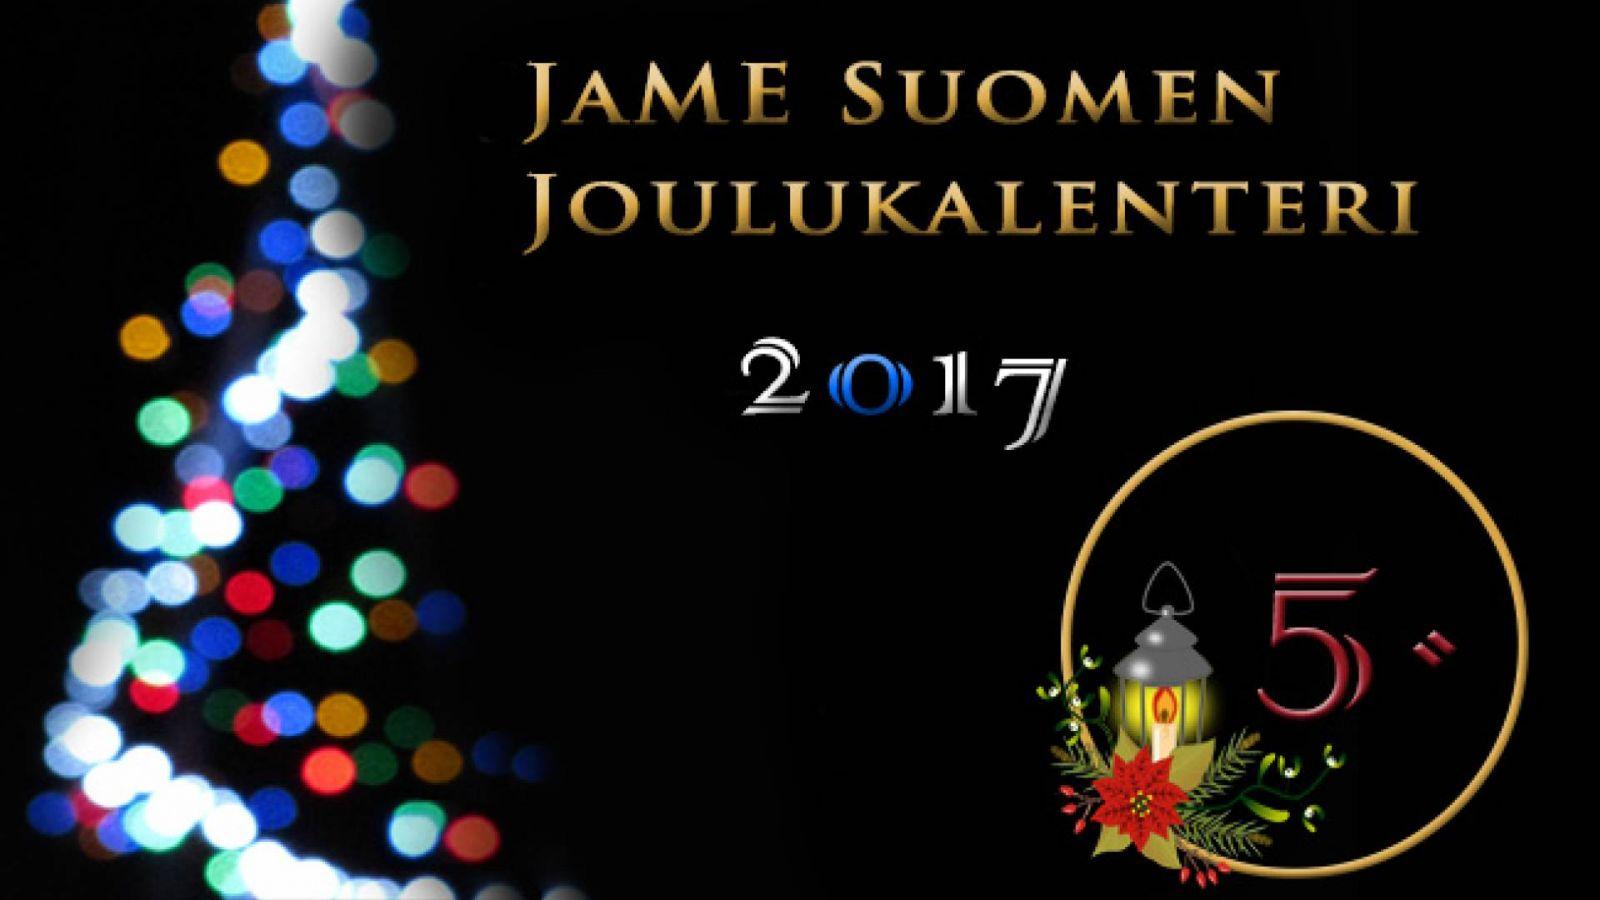 JaME Suomen joulukalenterin 5. luukku © Nipsu